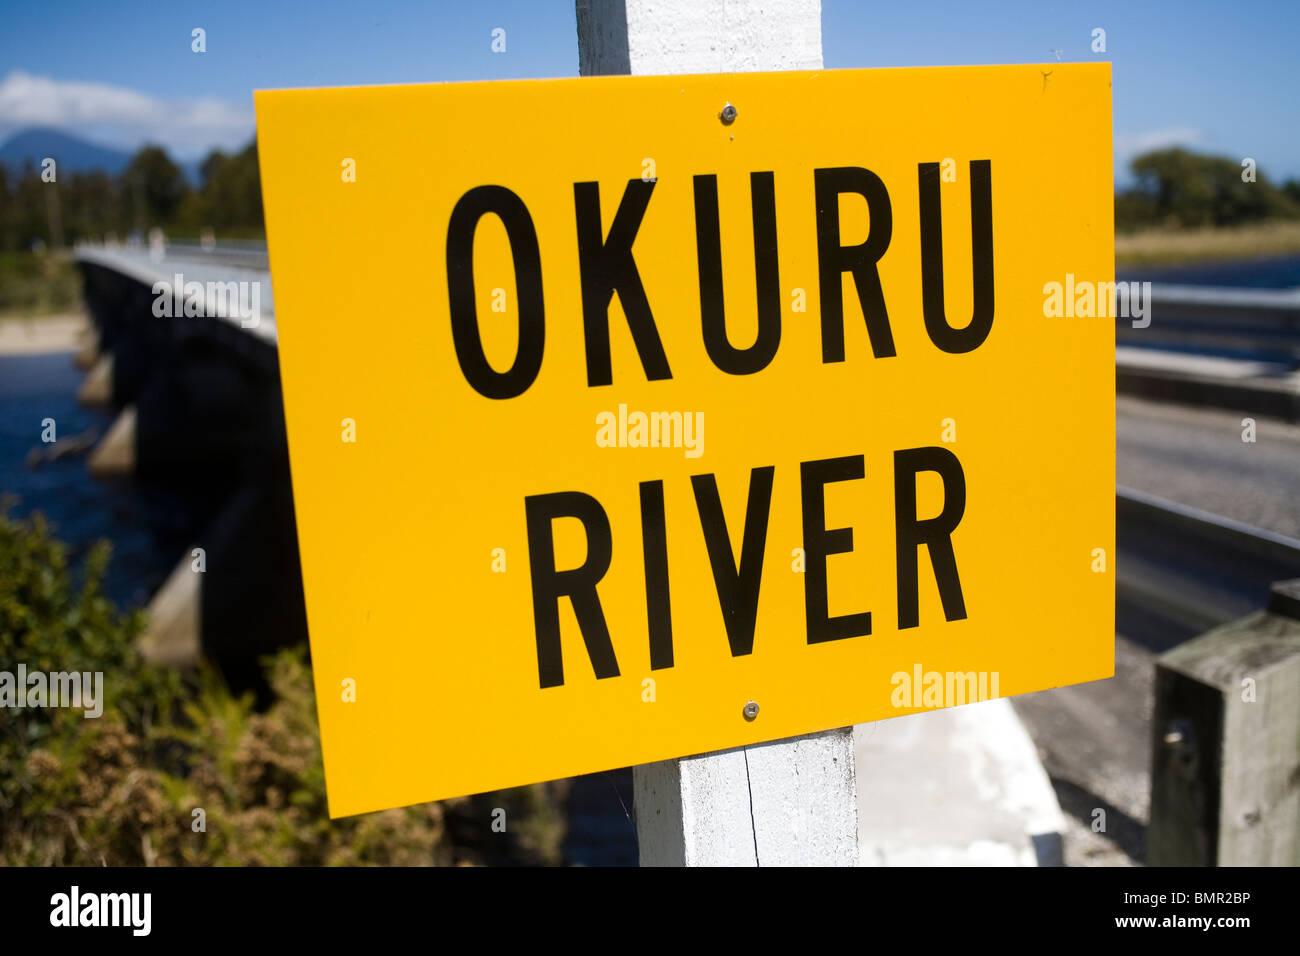 Bridge over the Okuru river, Westland, New Zealand, South Island. - Stock Image